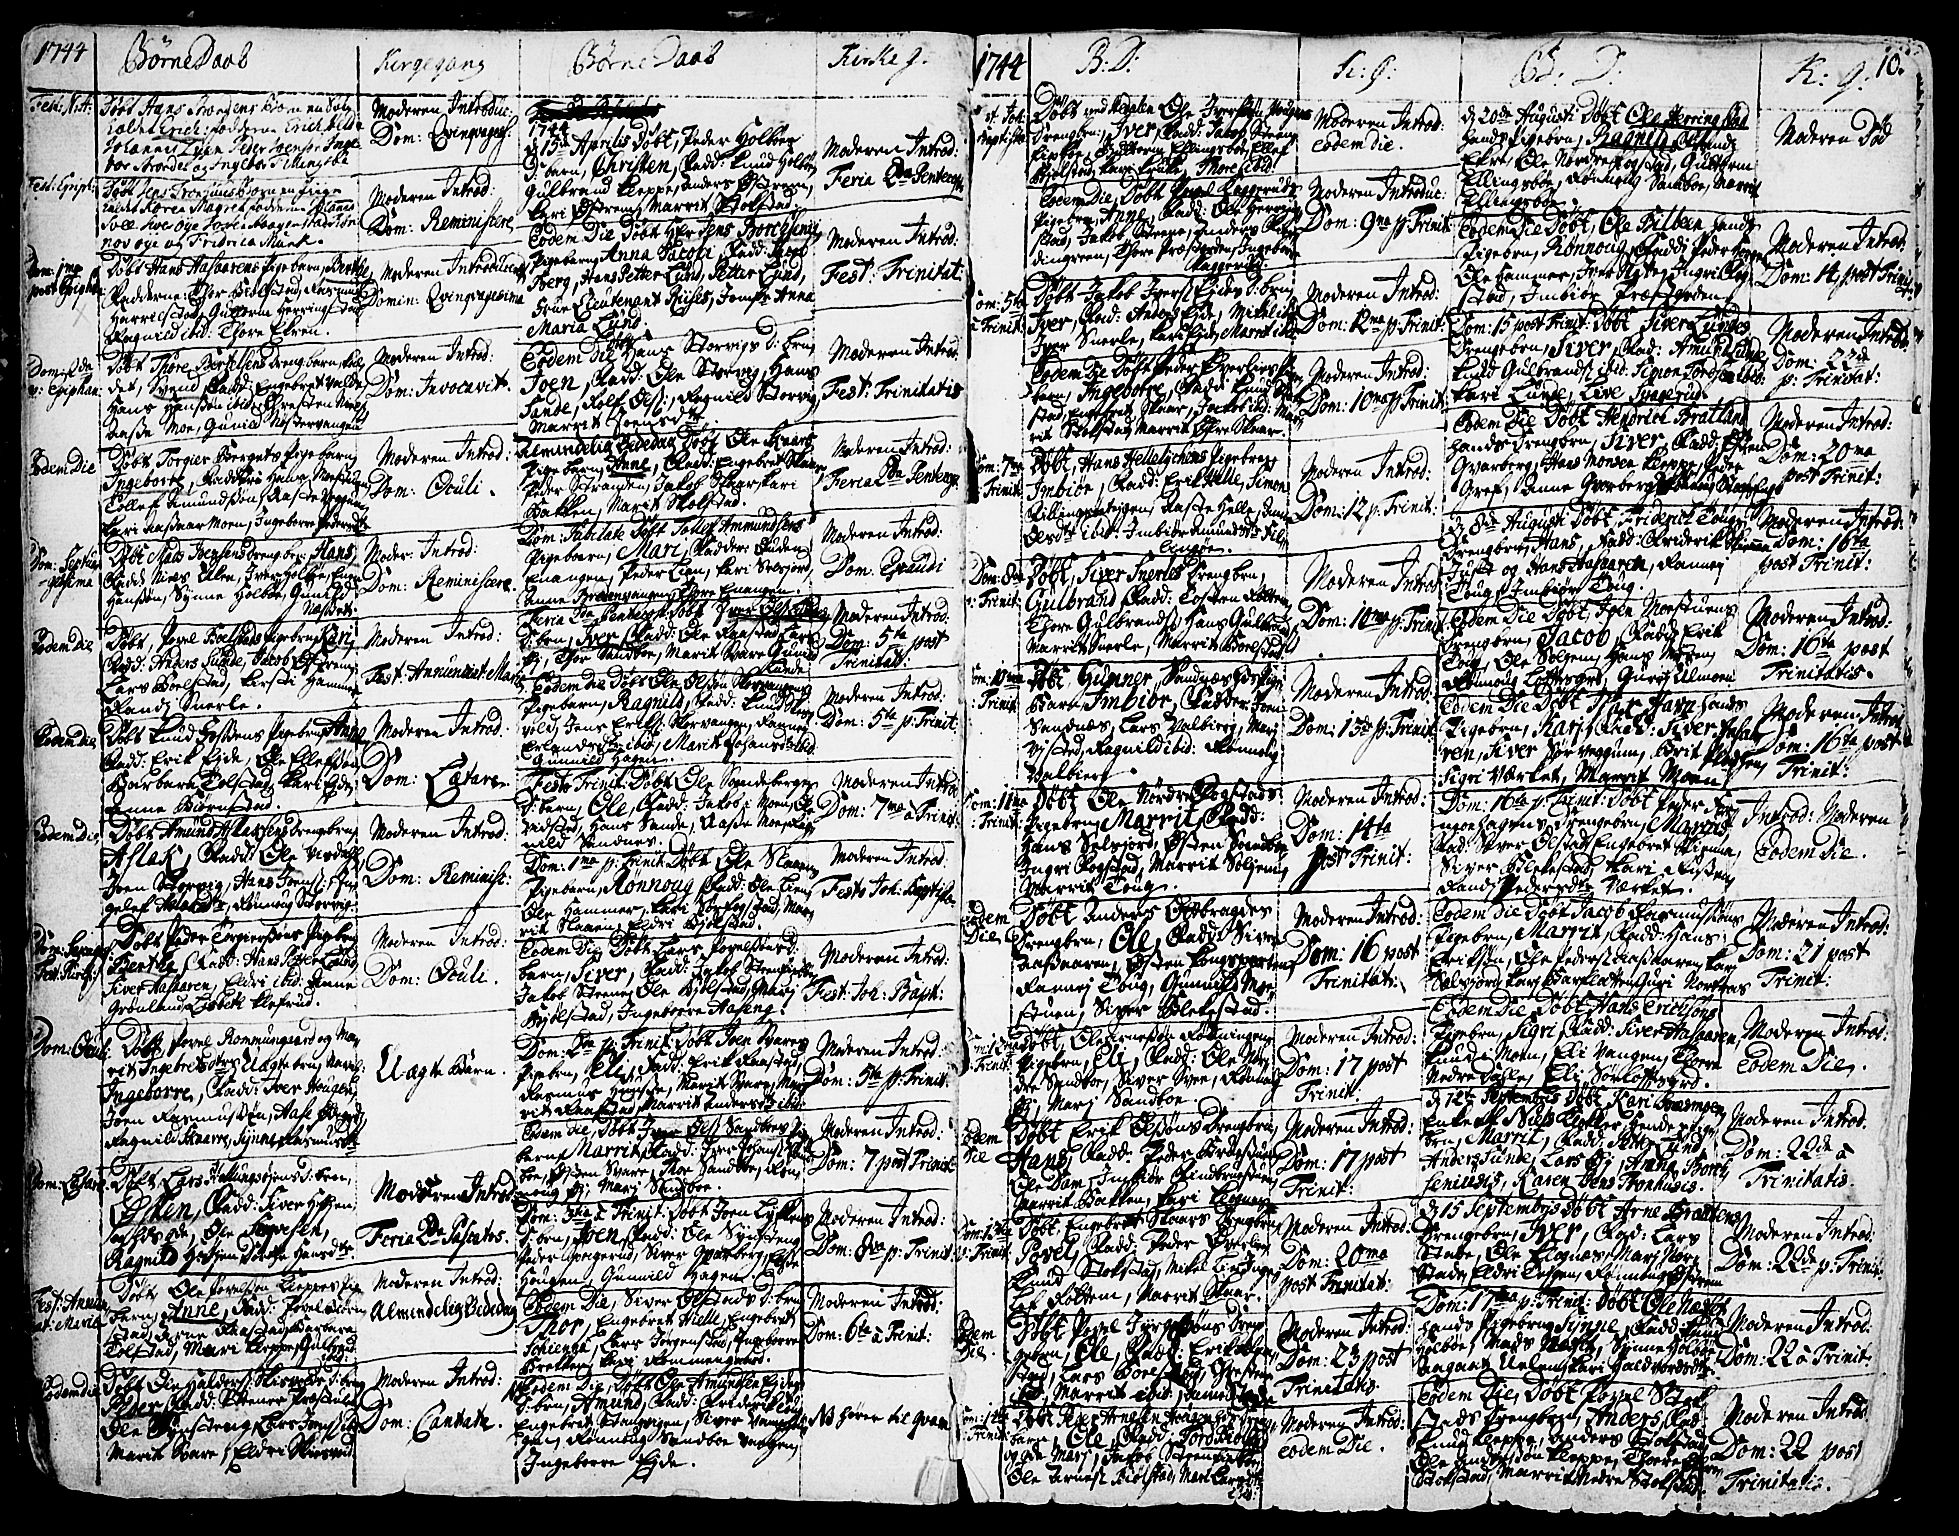 SAH, Vågå prestekontor, Ministerialbok nr. 1, 1739-1810, s. 10